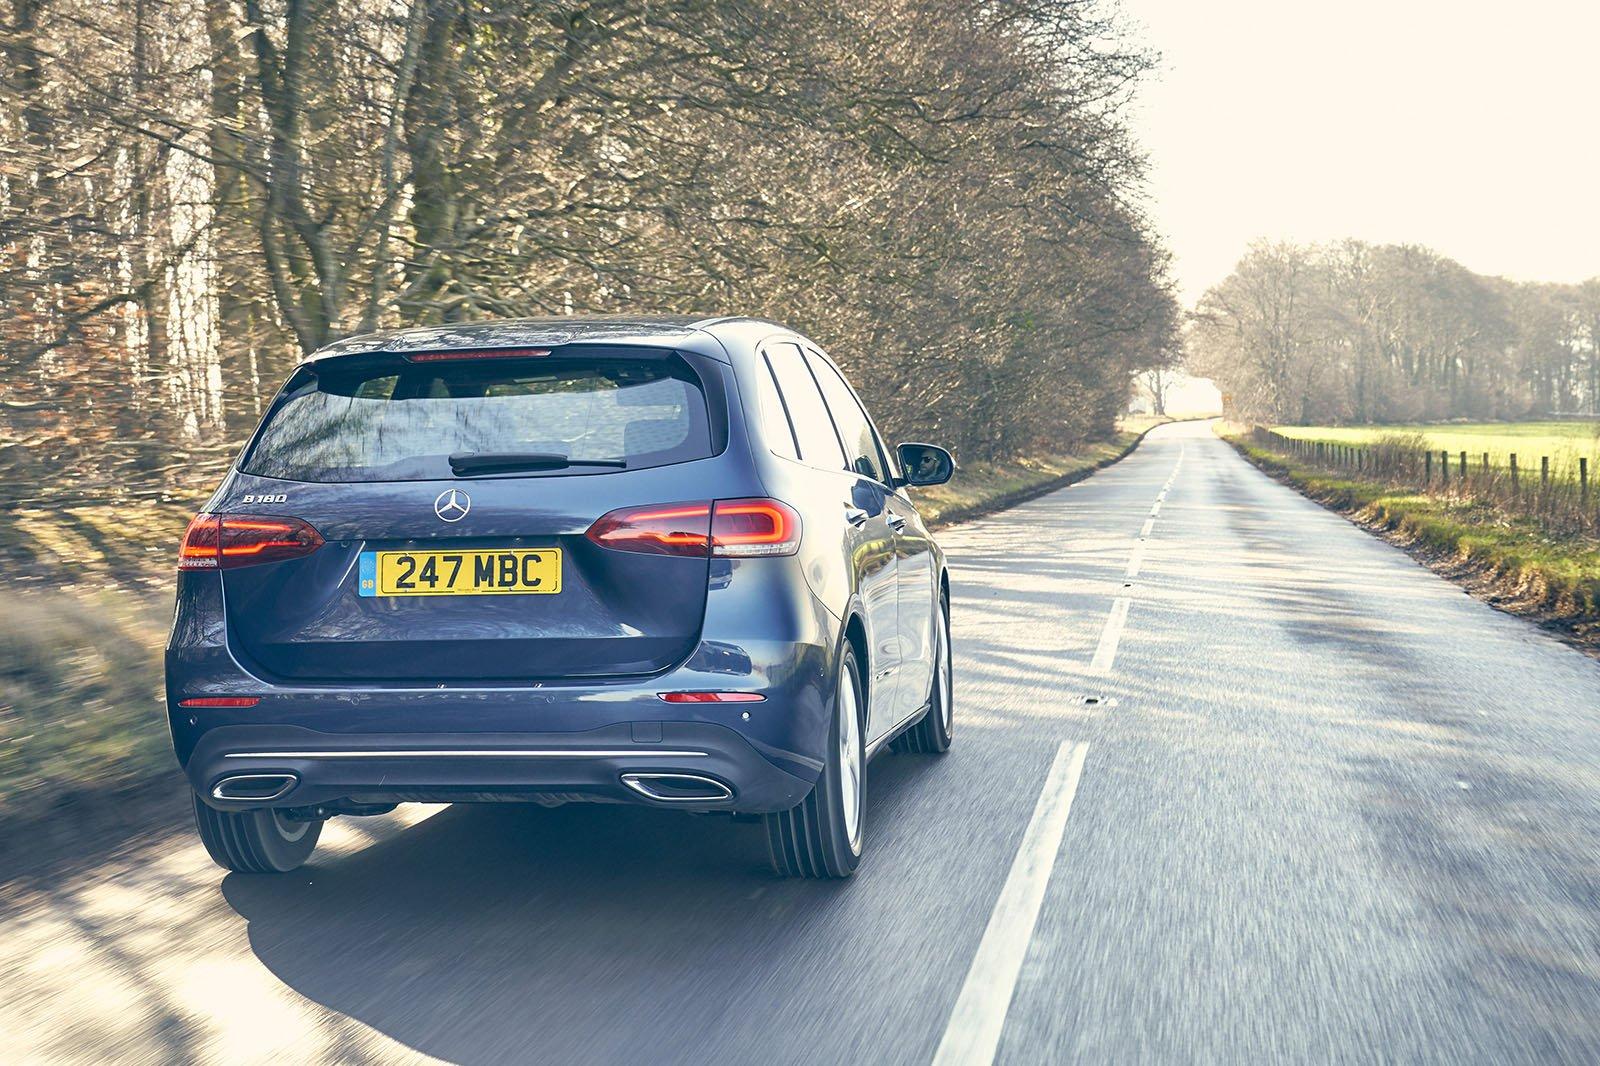 Mercedes B-Class MPV 2020 rear tracking